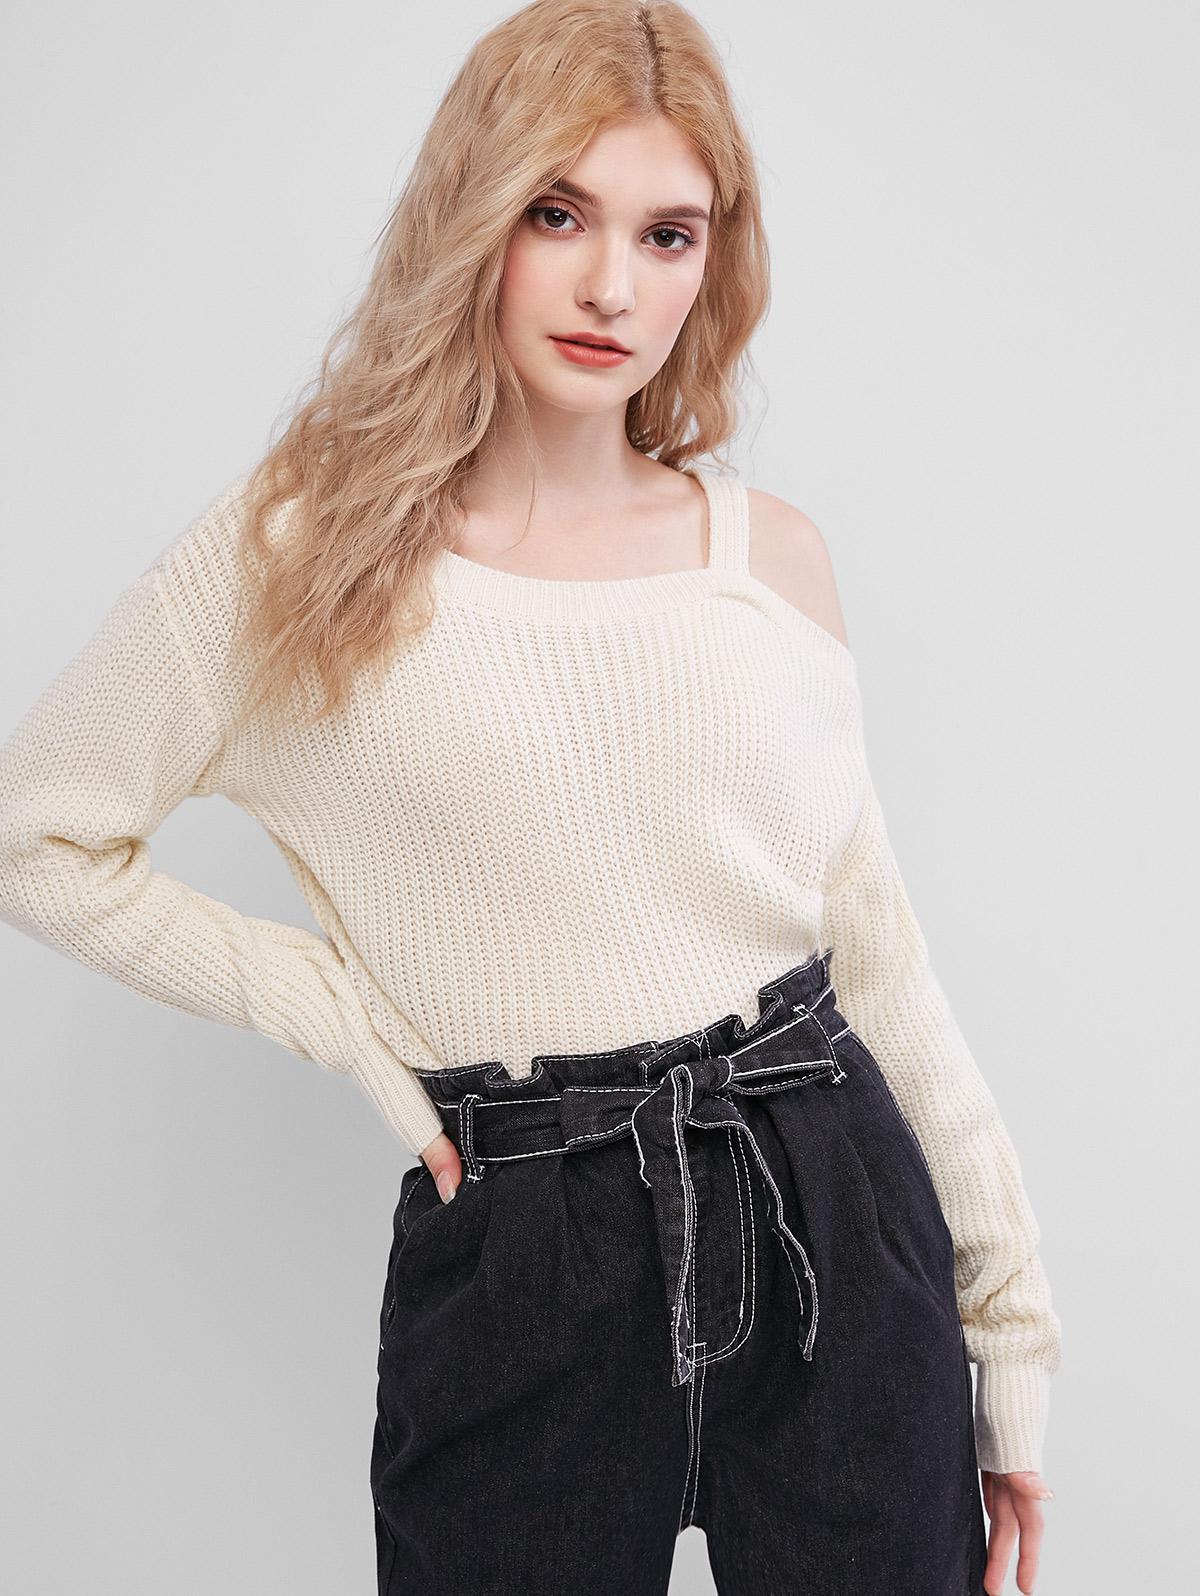 Skew Neck Sweater